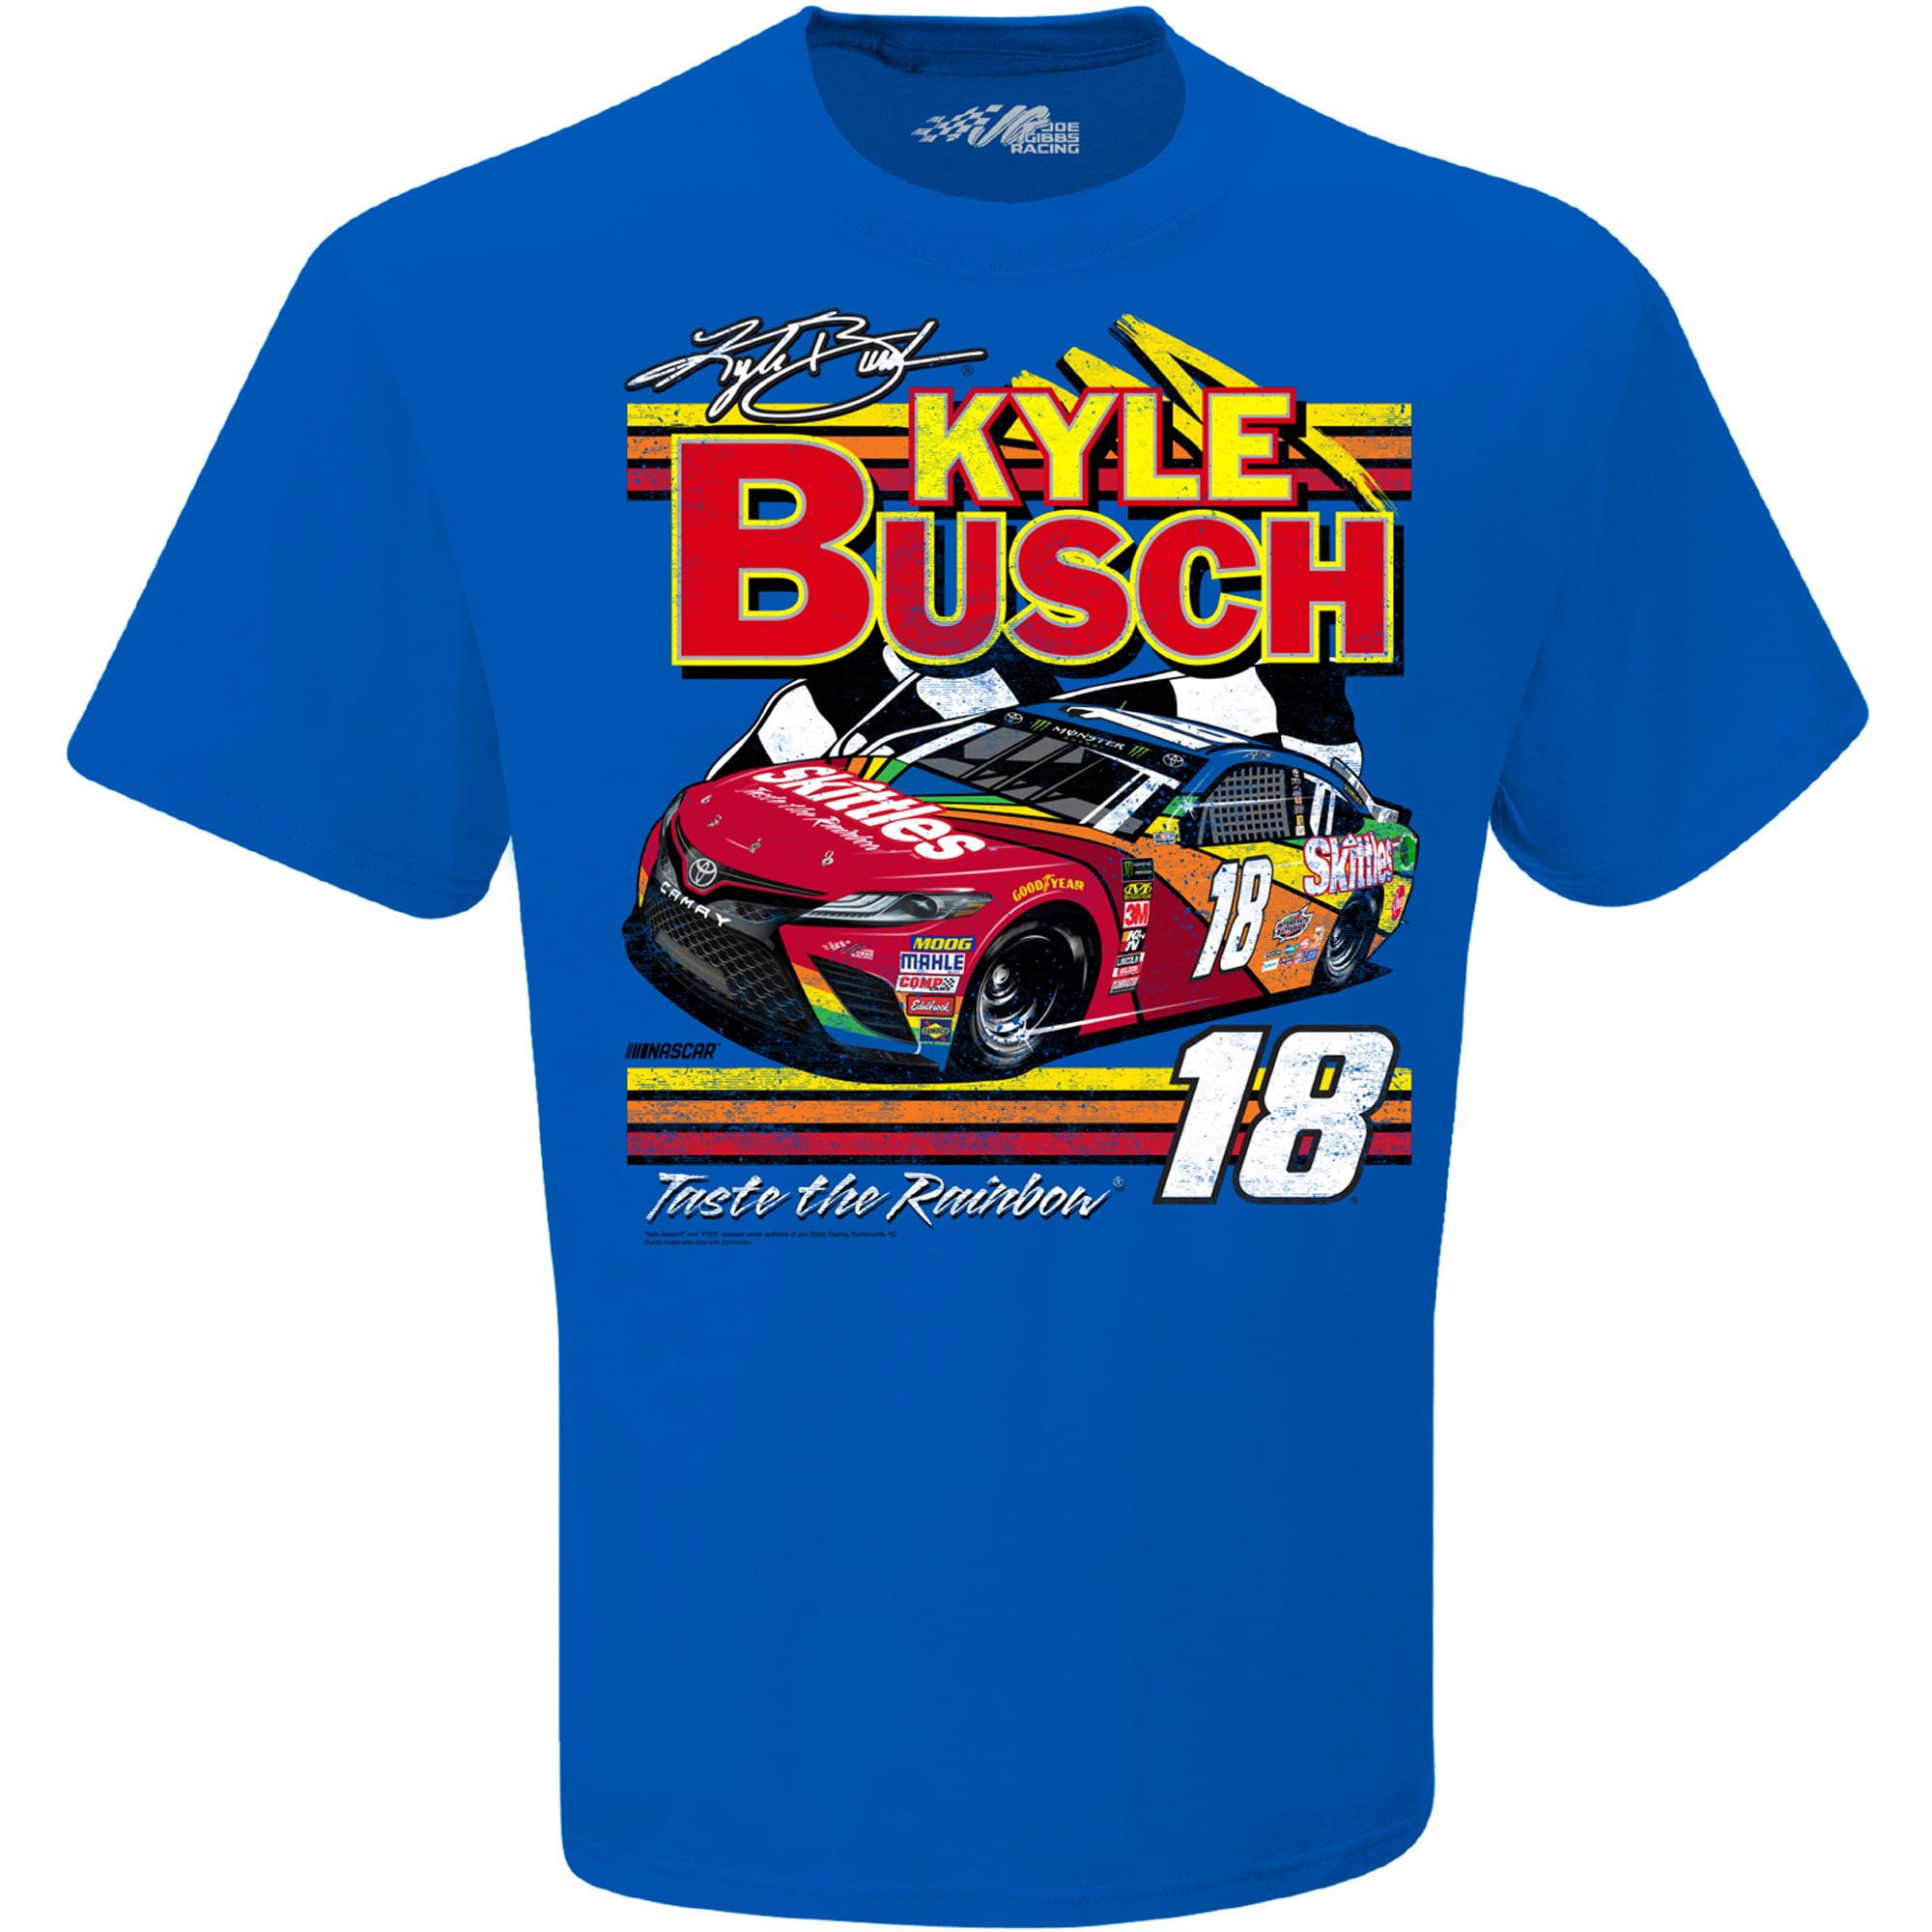 Kyle Busch Joe Gibbs Racing Team Collection Skittles Darlington Car T-Shirt - Royal